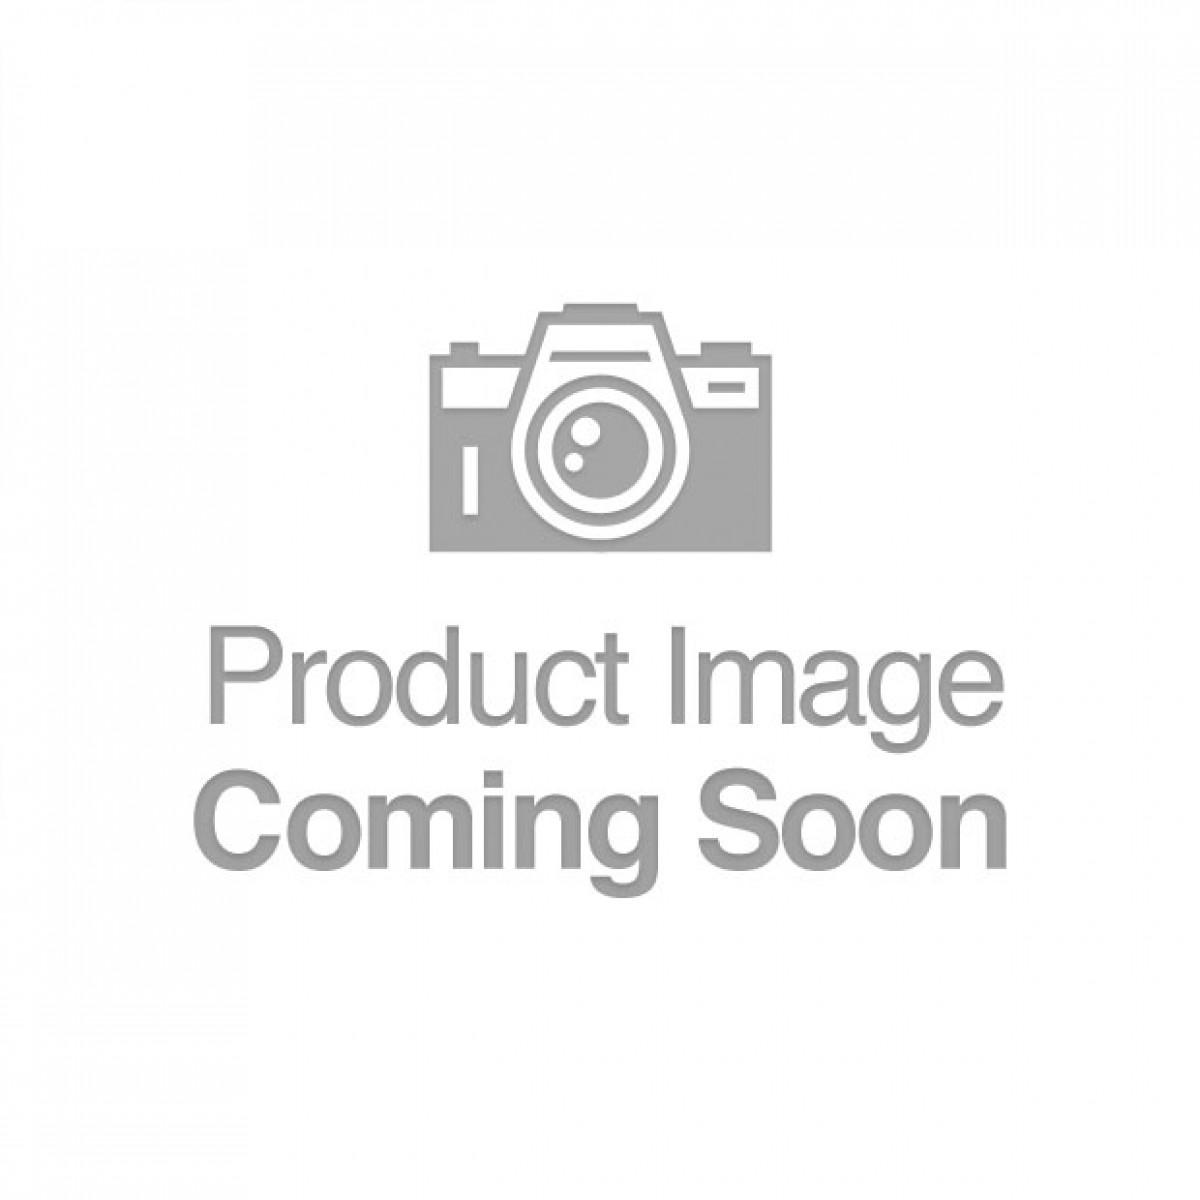 b-Vibe Weighted Snug Plug 6 - 515 g Black